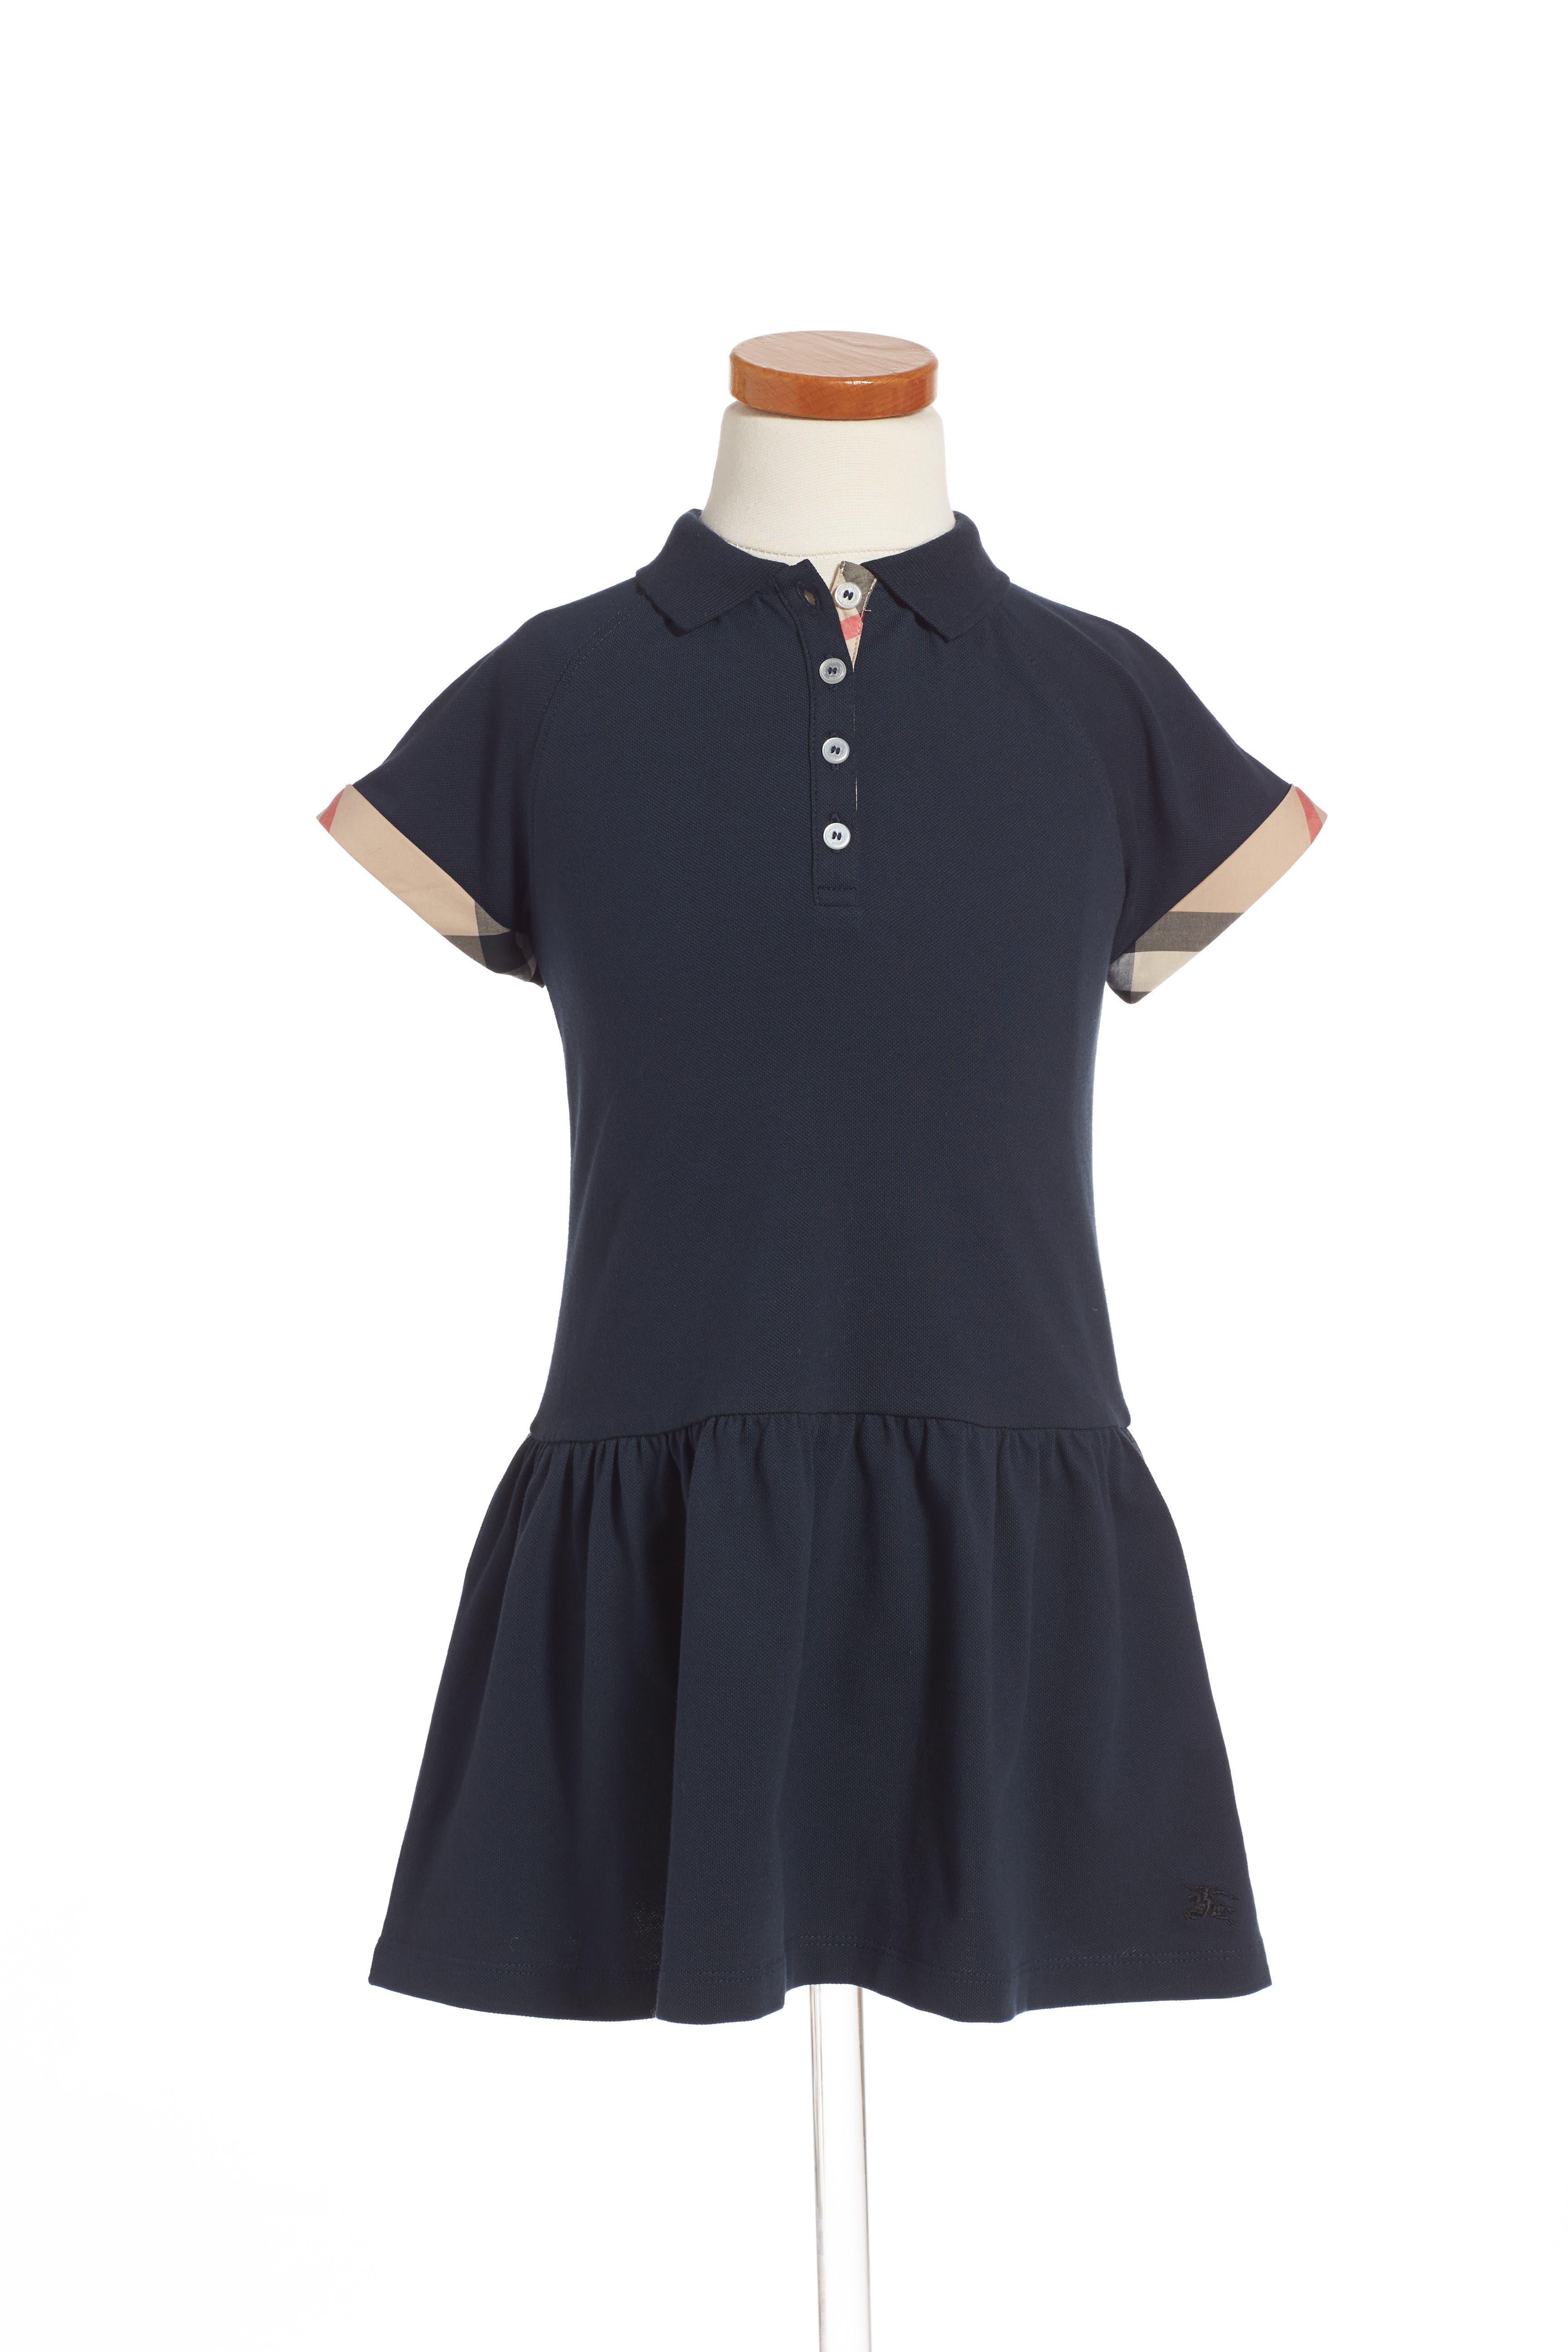 Burberry 'Mini Cali' Polo Dress (Little Girls & Big Girls)